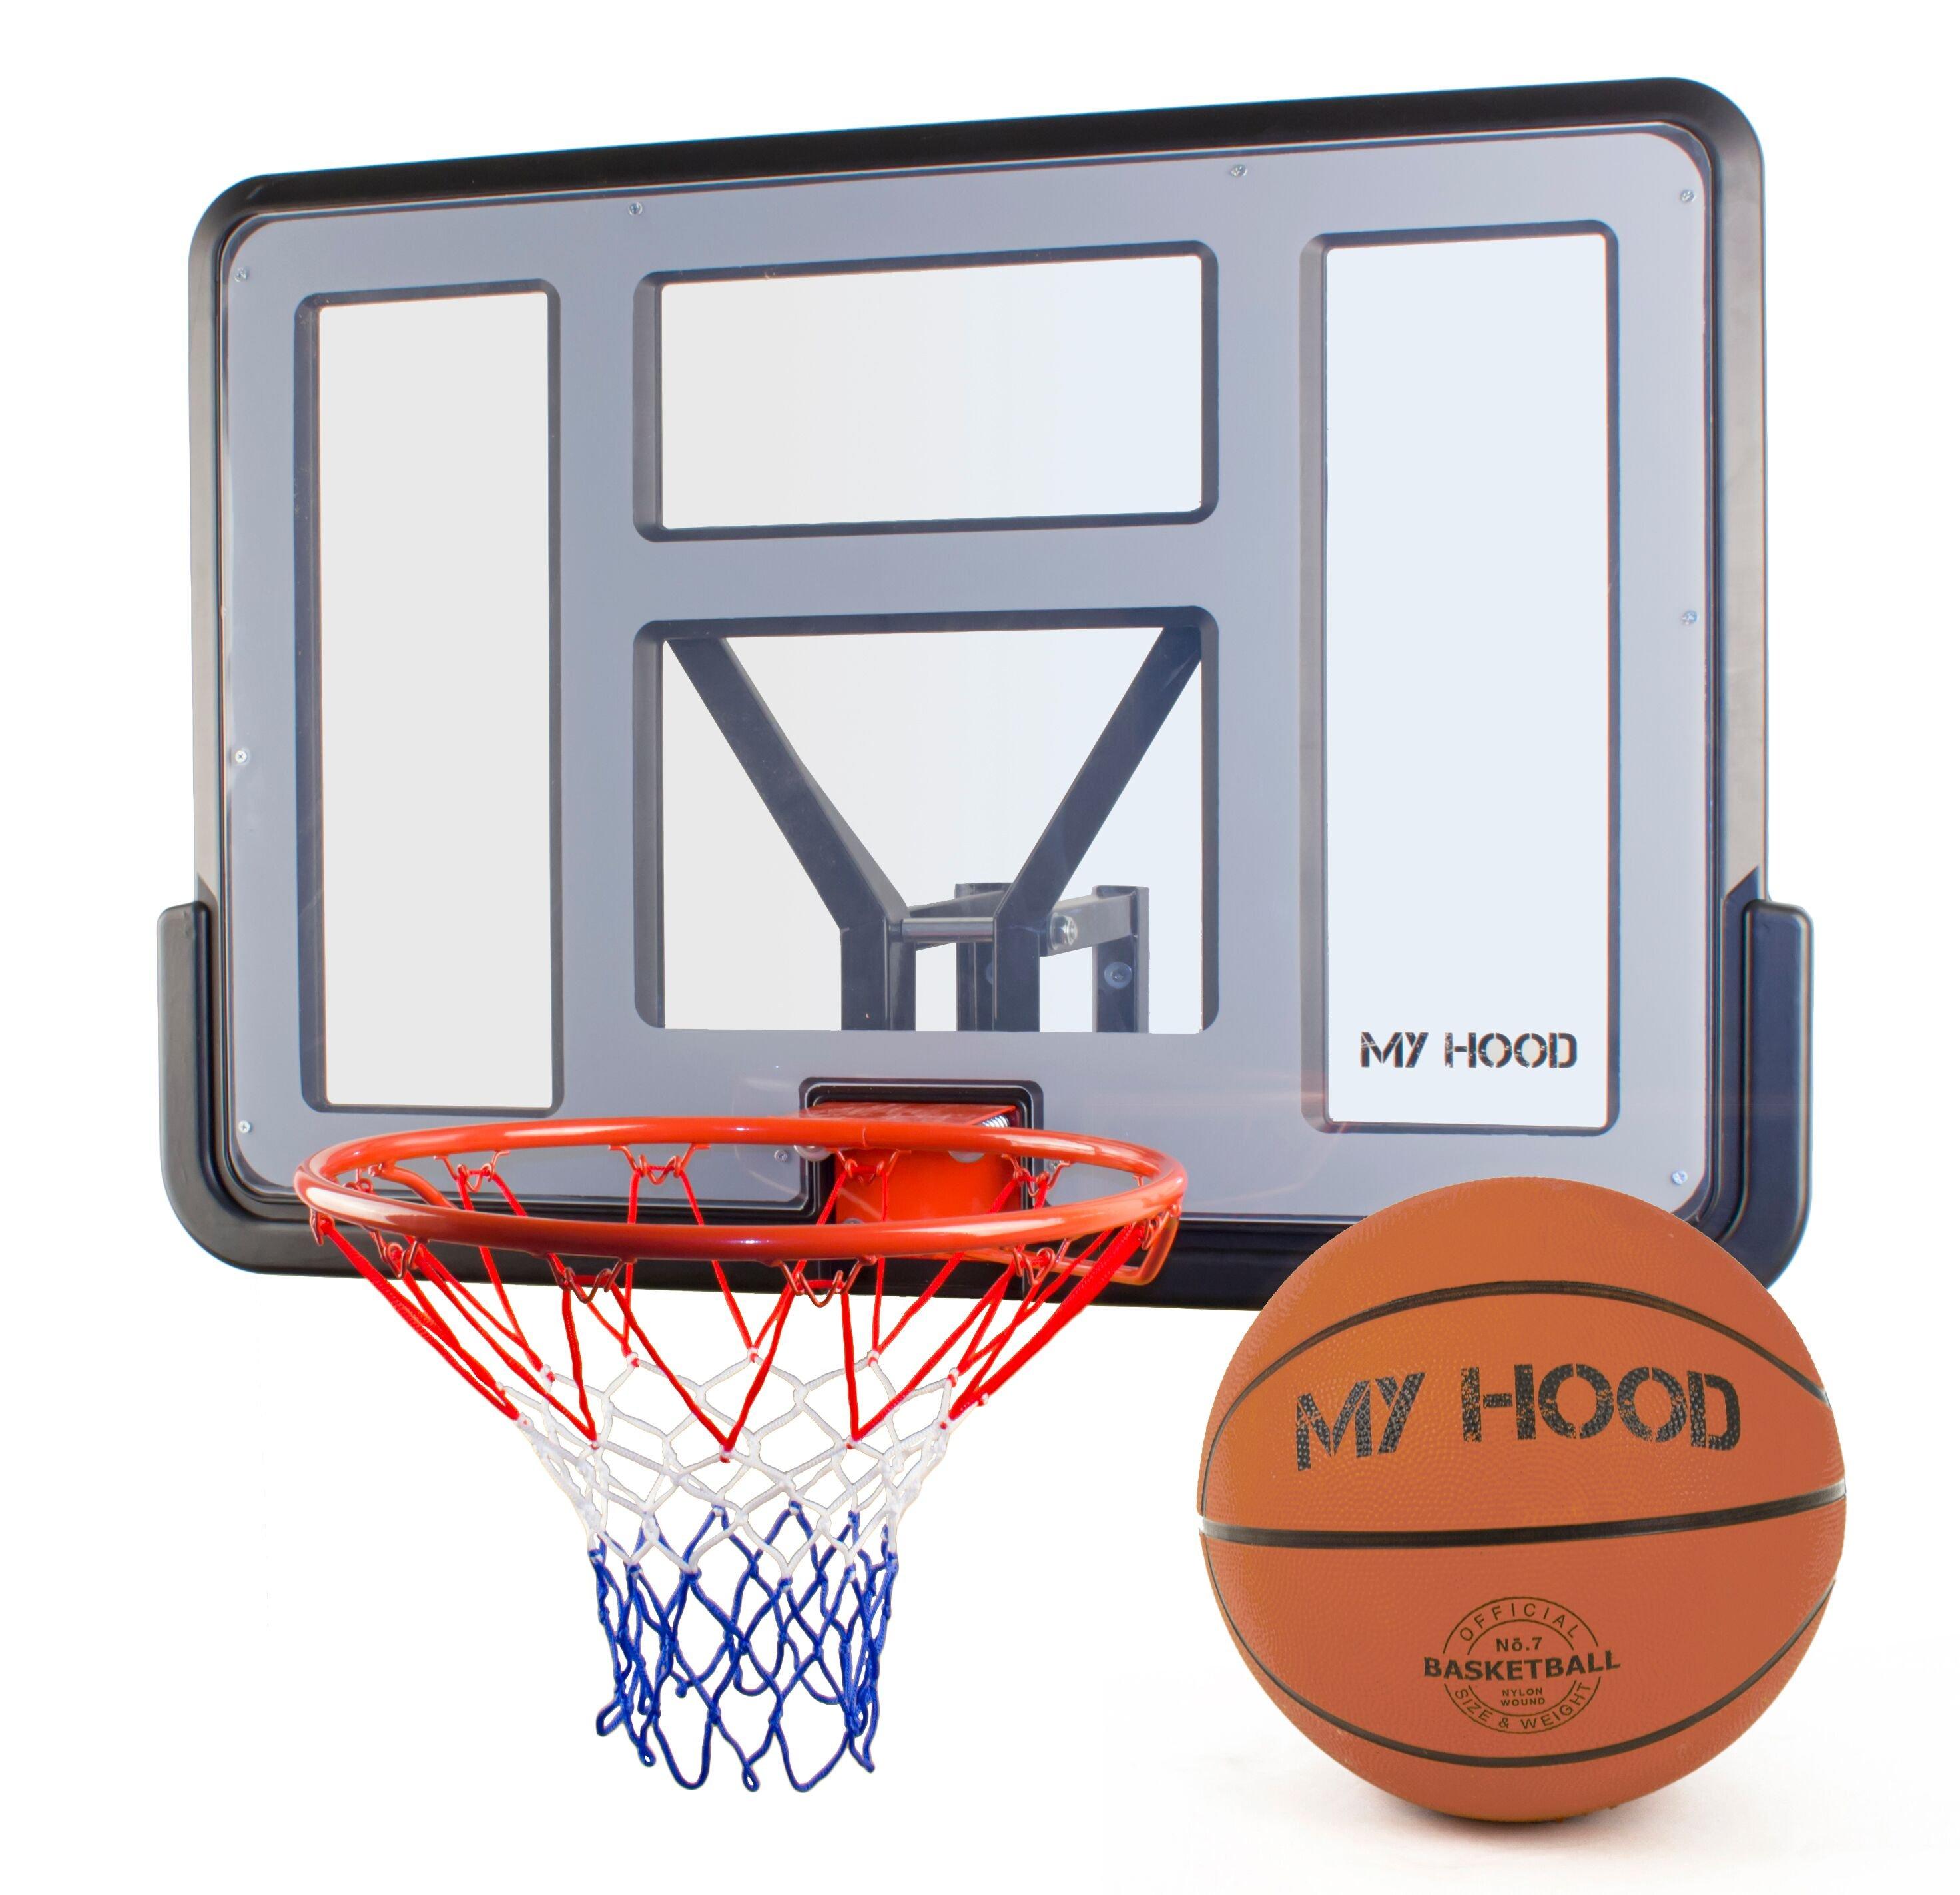 My Hood - Pro Basketball Hoop Set with Basketball (304013)